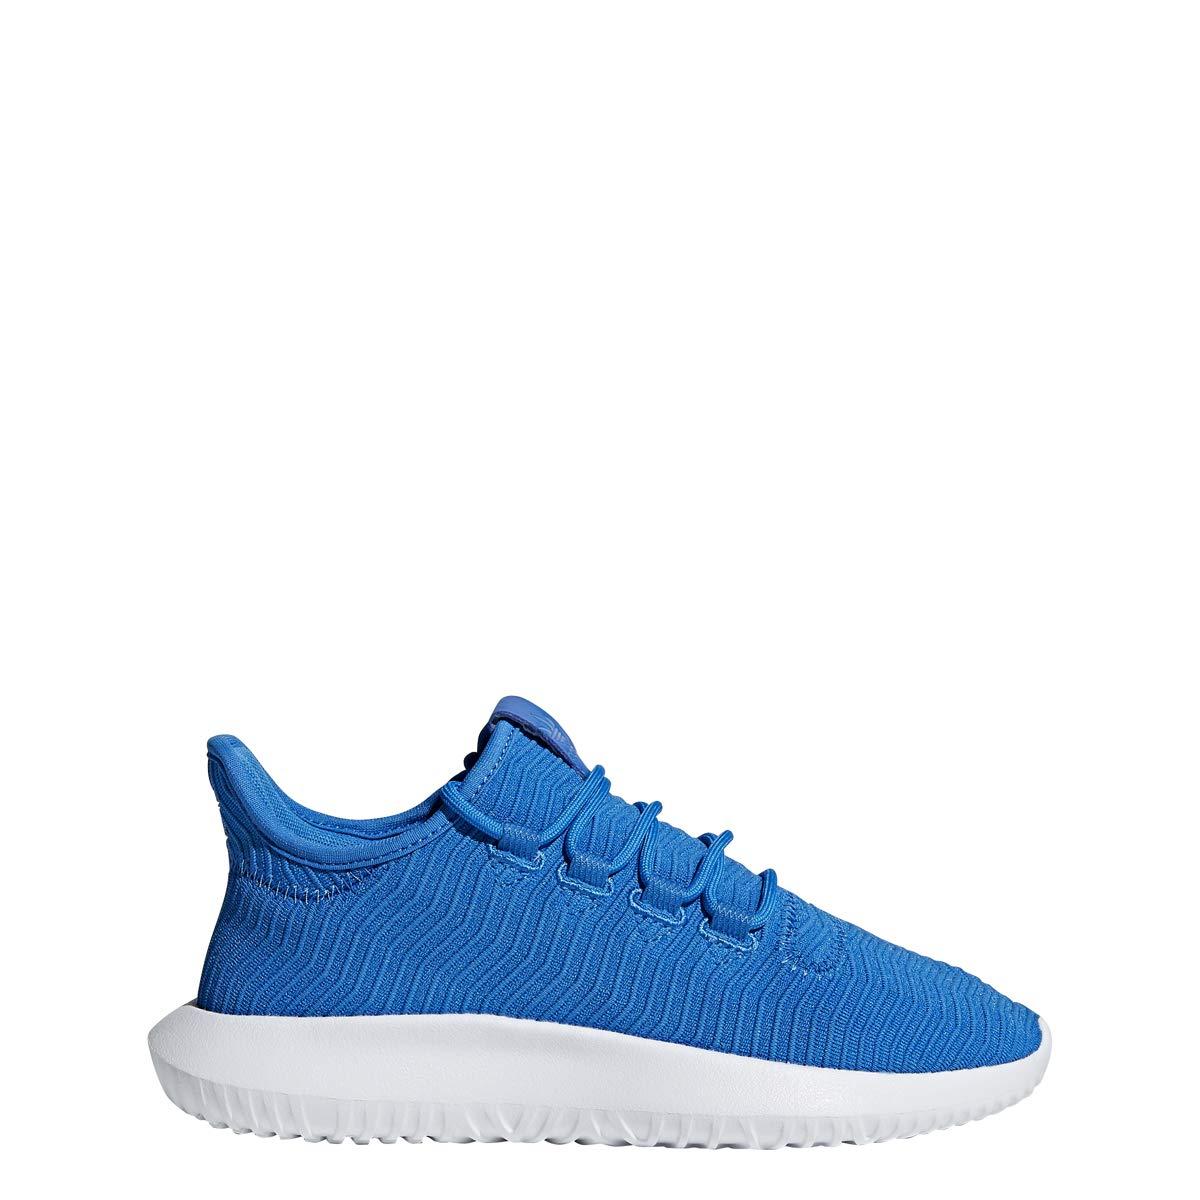 adidas Originals Unisex Tubular Shadow Running Shoe, Bluebird, 4.5 M US Big Kid